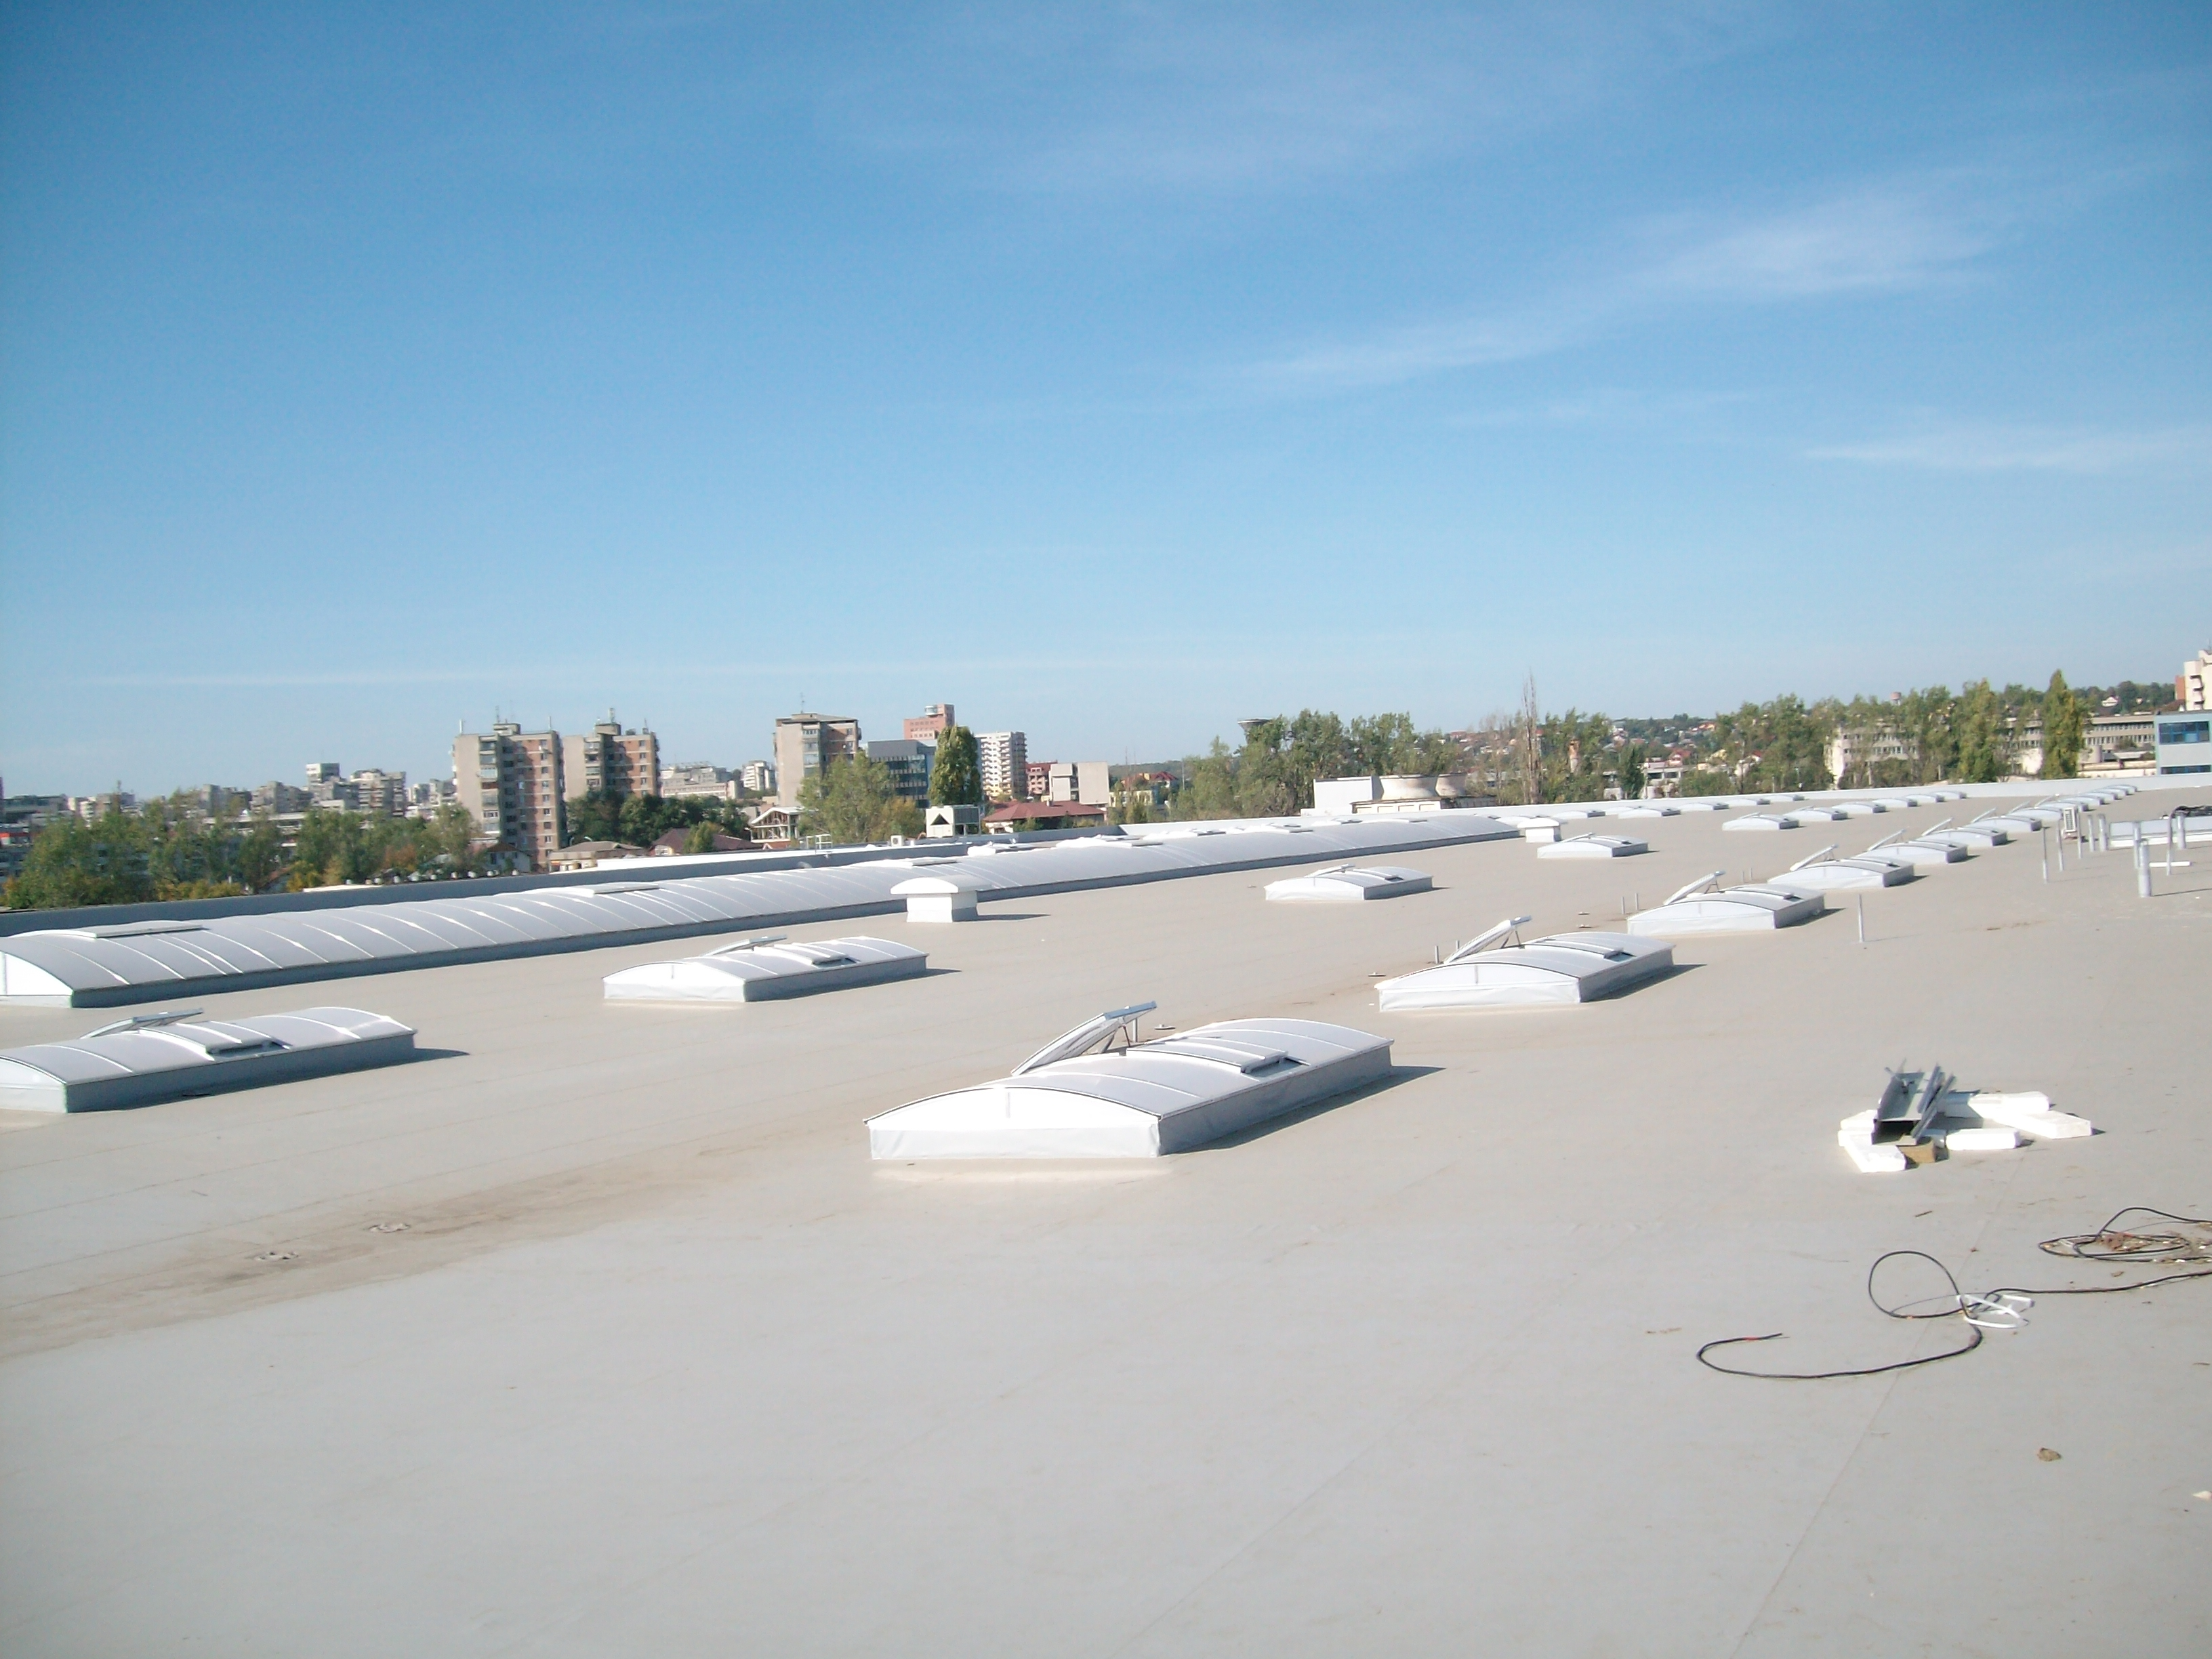 Luminatoare industriale - Spatiu comercial Baumax - Iasi HEXADOME - Poza 1